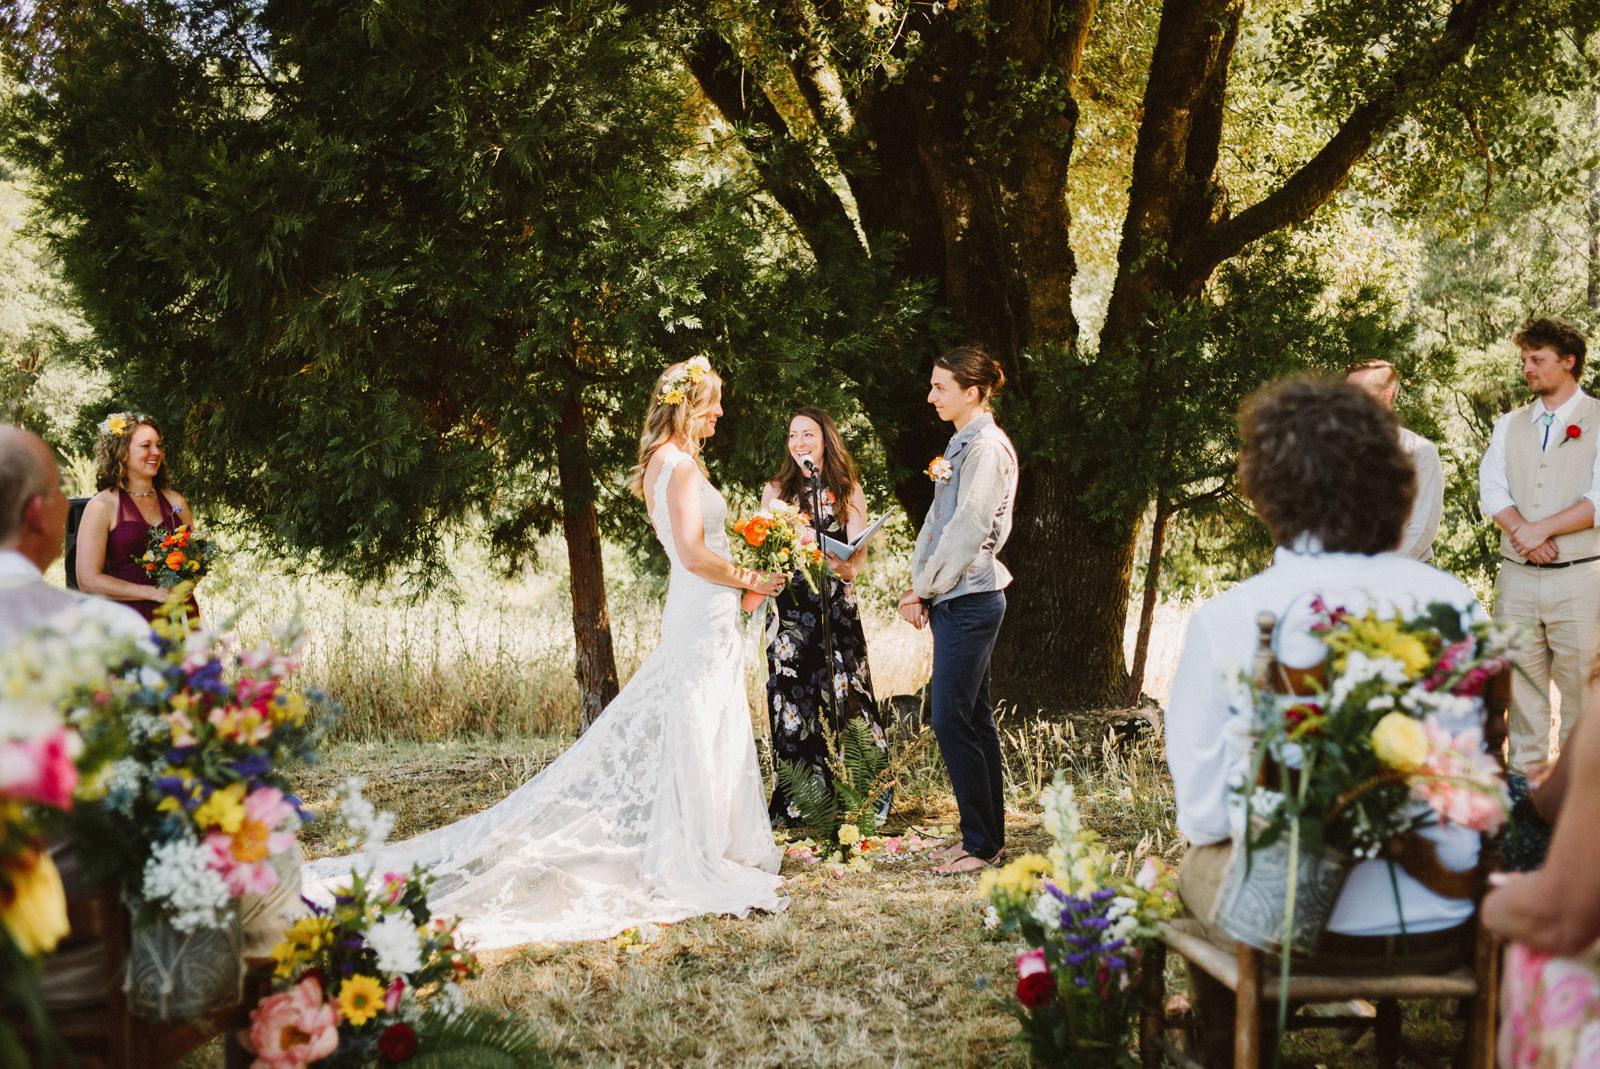 rivers-bend-retreat-wedding-026 RIVER'S BEND RETREAT WEDDING